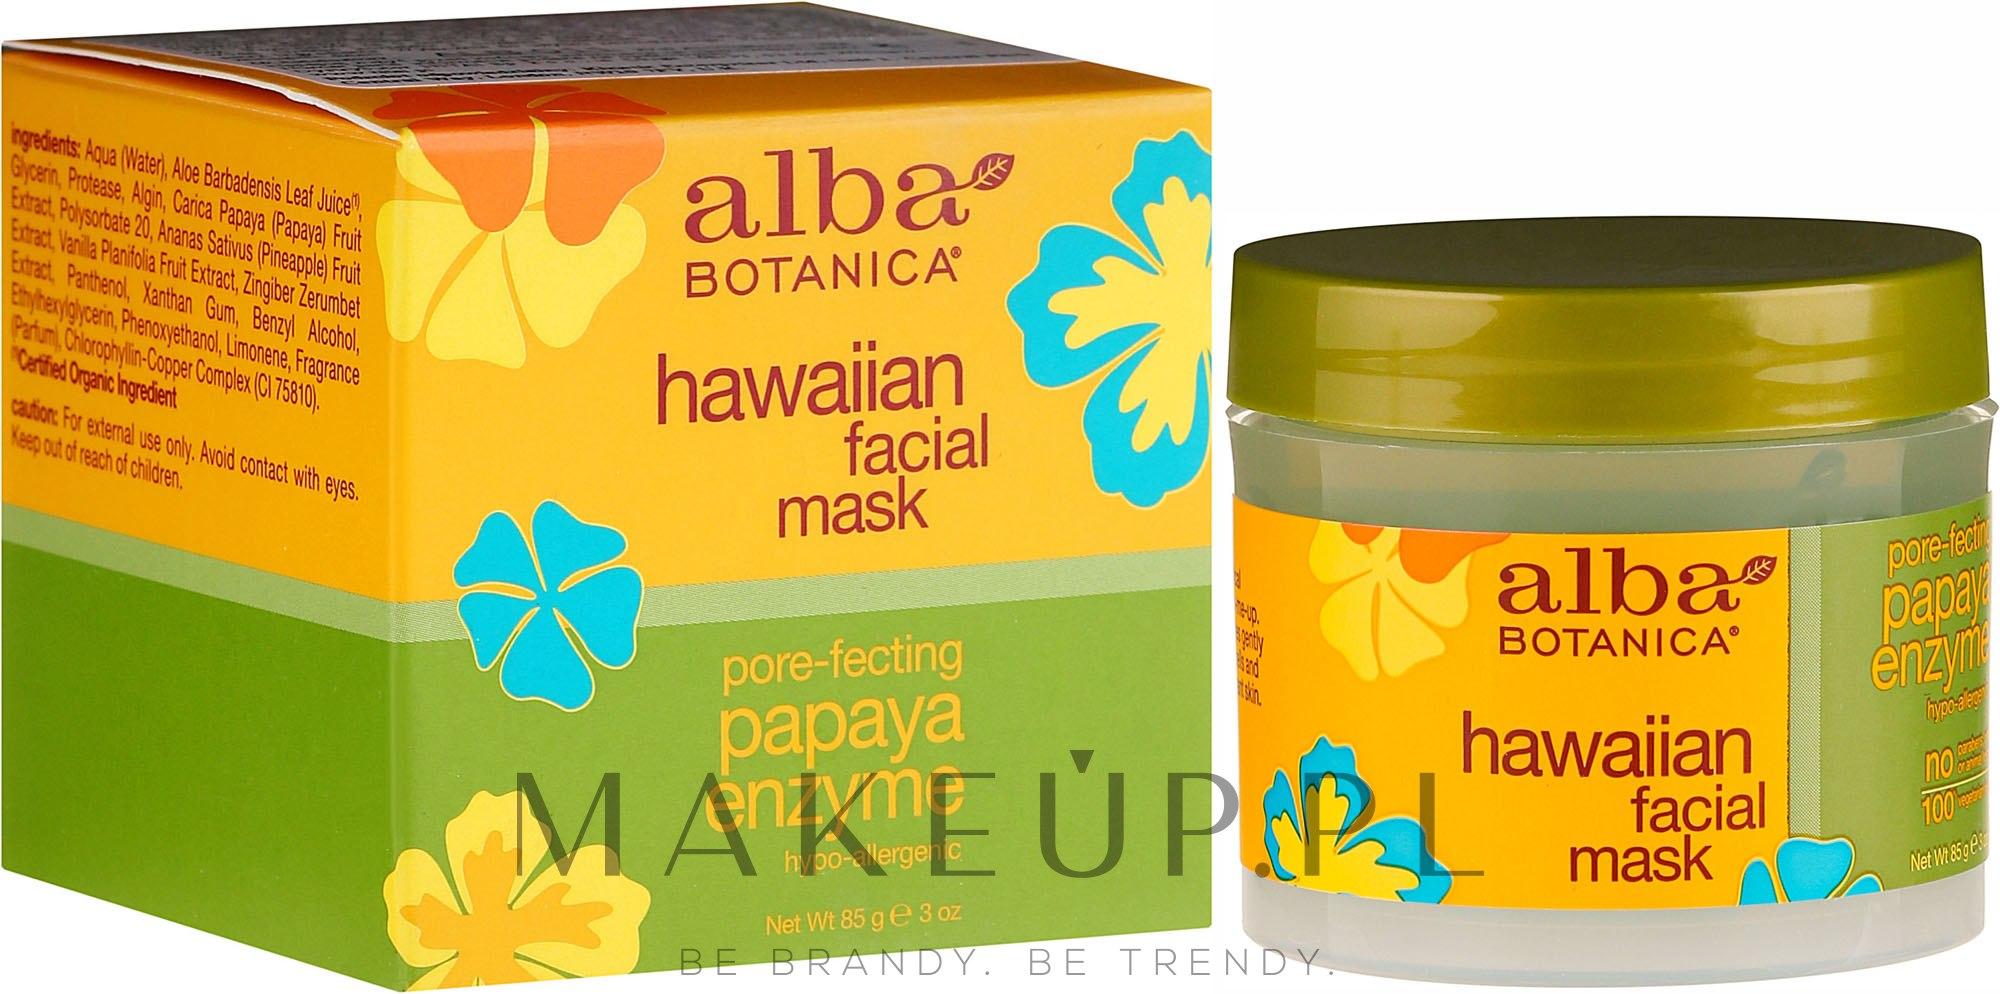 Maska do twarzy Papaja - Alba Botanica Natural Hawaiian Facial Scrub Pore Purifying Pineapple Enzyme — фото 85 ml